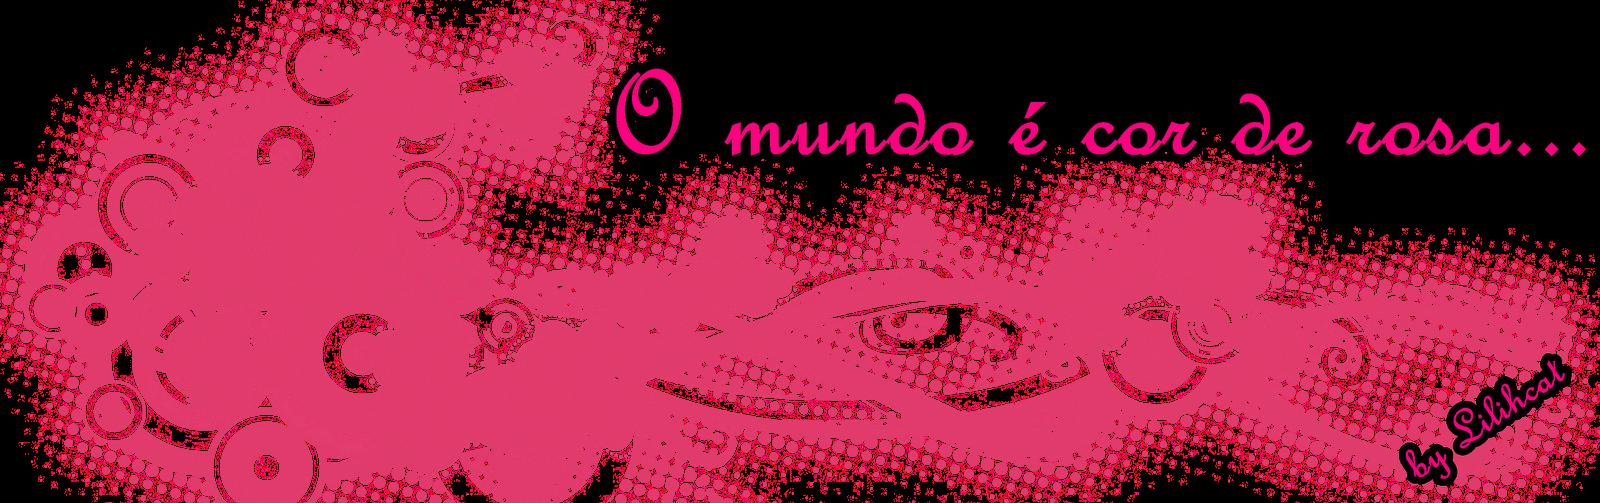 Meu mundo  cor de rosa